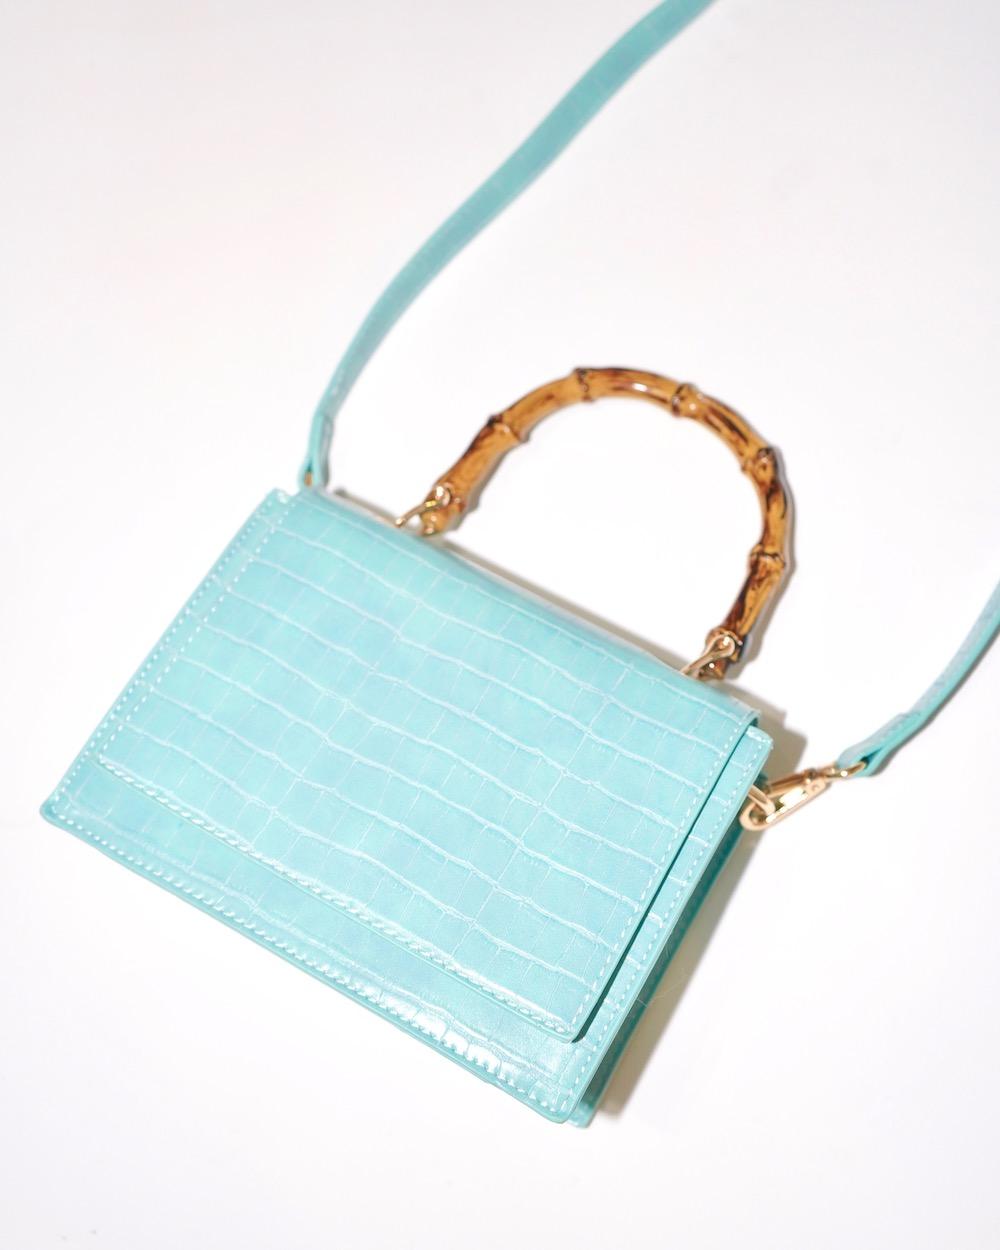 Bamboo Handle Crocodile Touch 2way Bag (light blue)